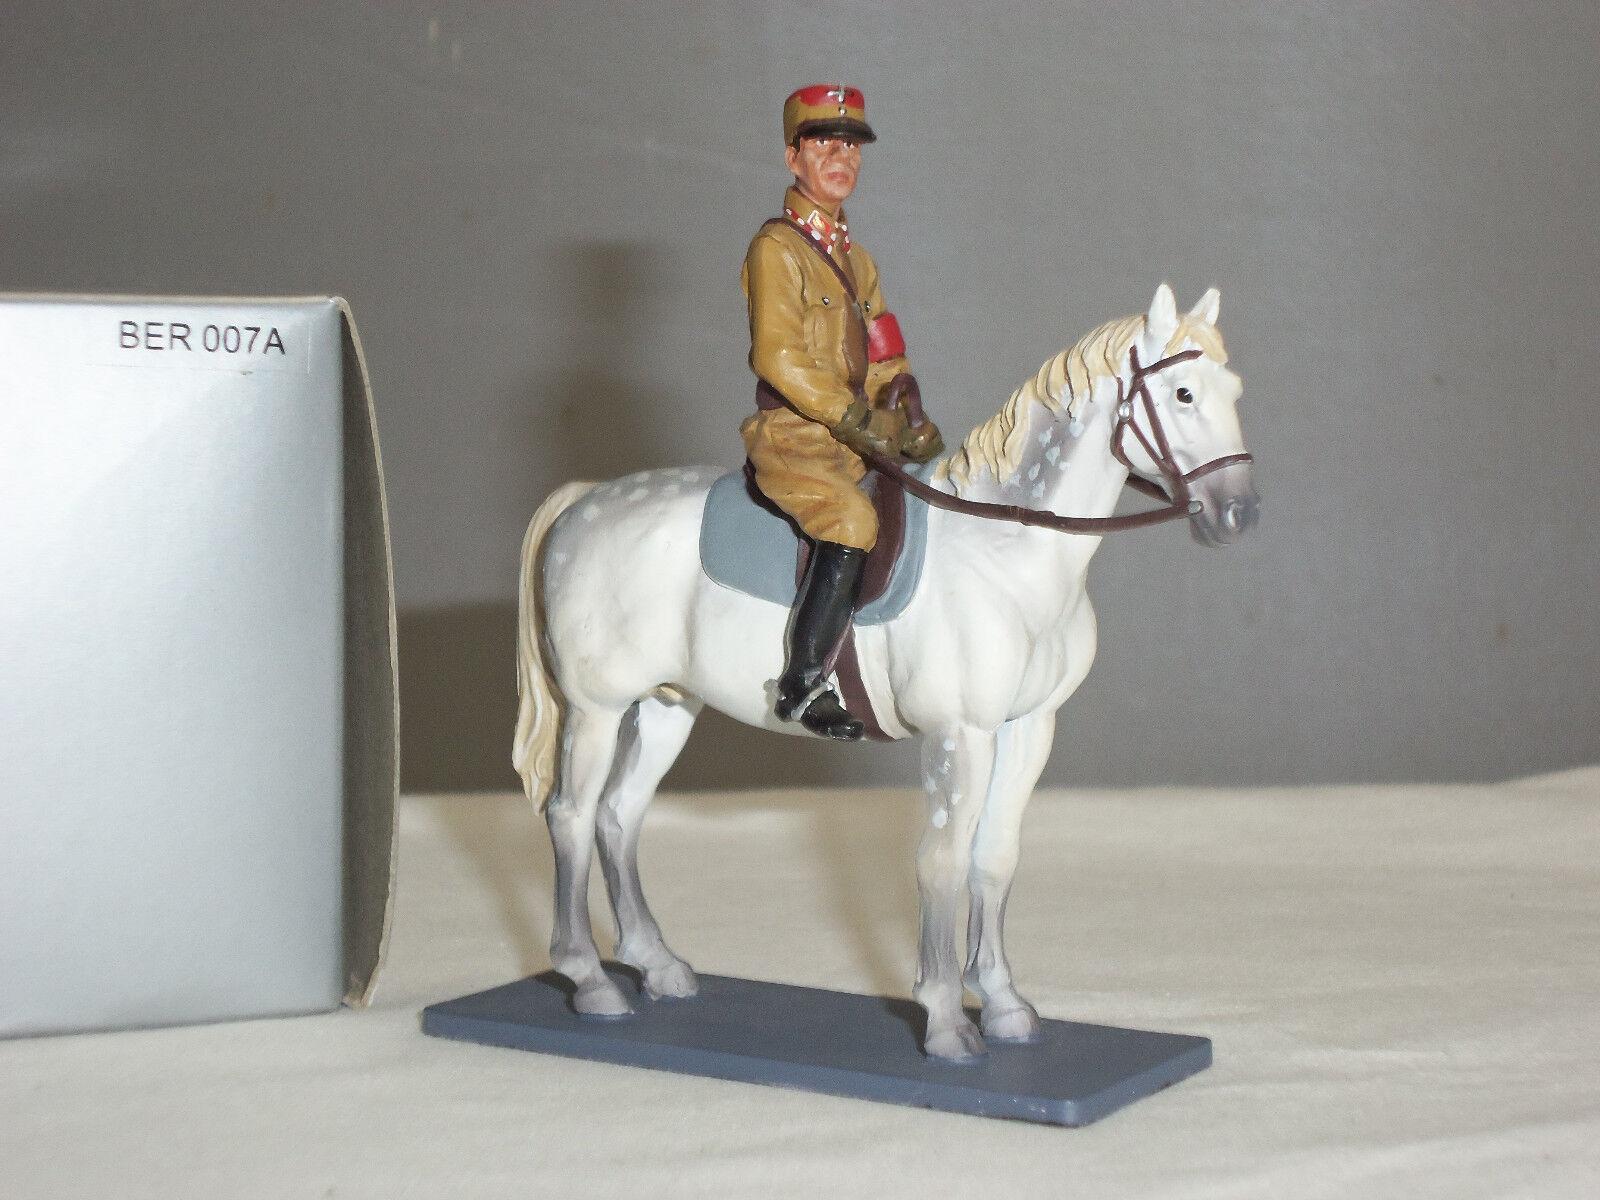 THOMAS GUNN BER007A GERMAN BERLIN WORLD WAR TWO OFFICER MOUNTED TOY SOLDIER